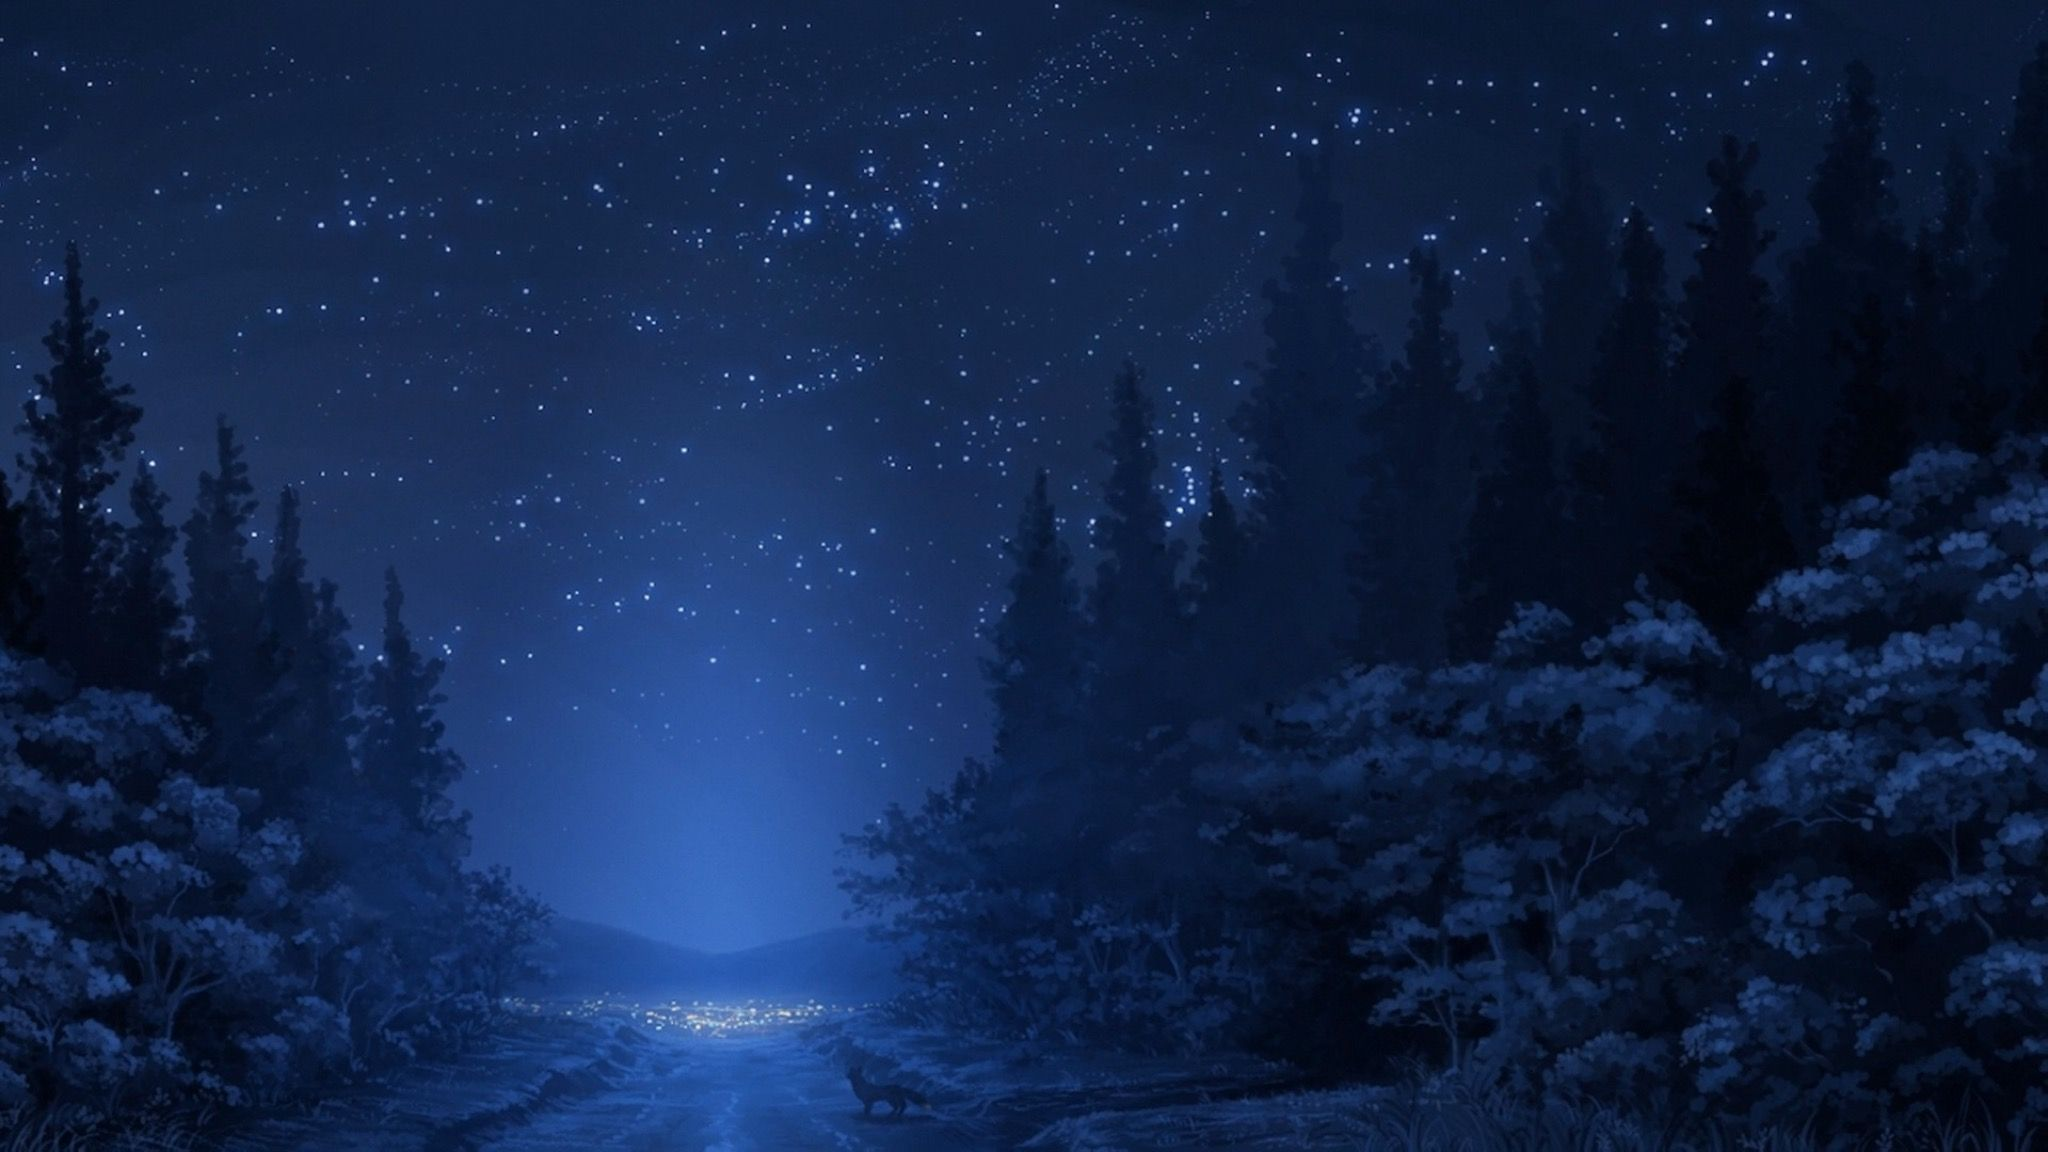 Night Time Anime Scenery Anime Scenery Wallpaper Scenery Wallpaper